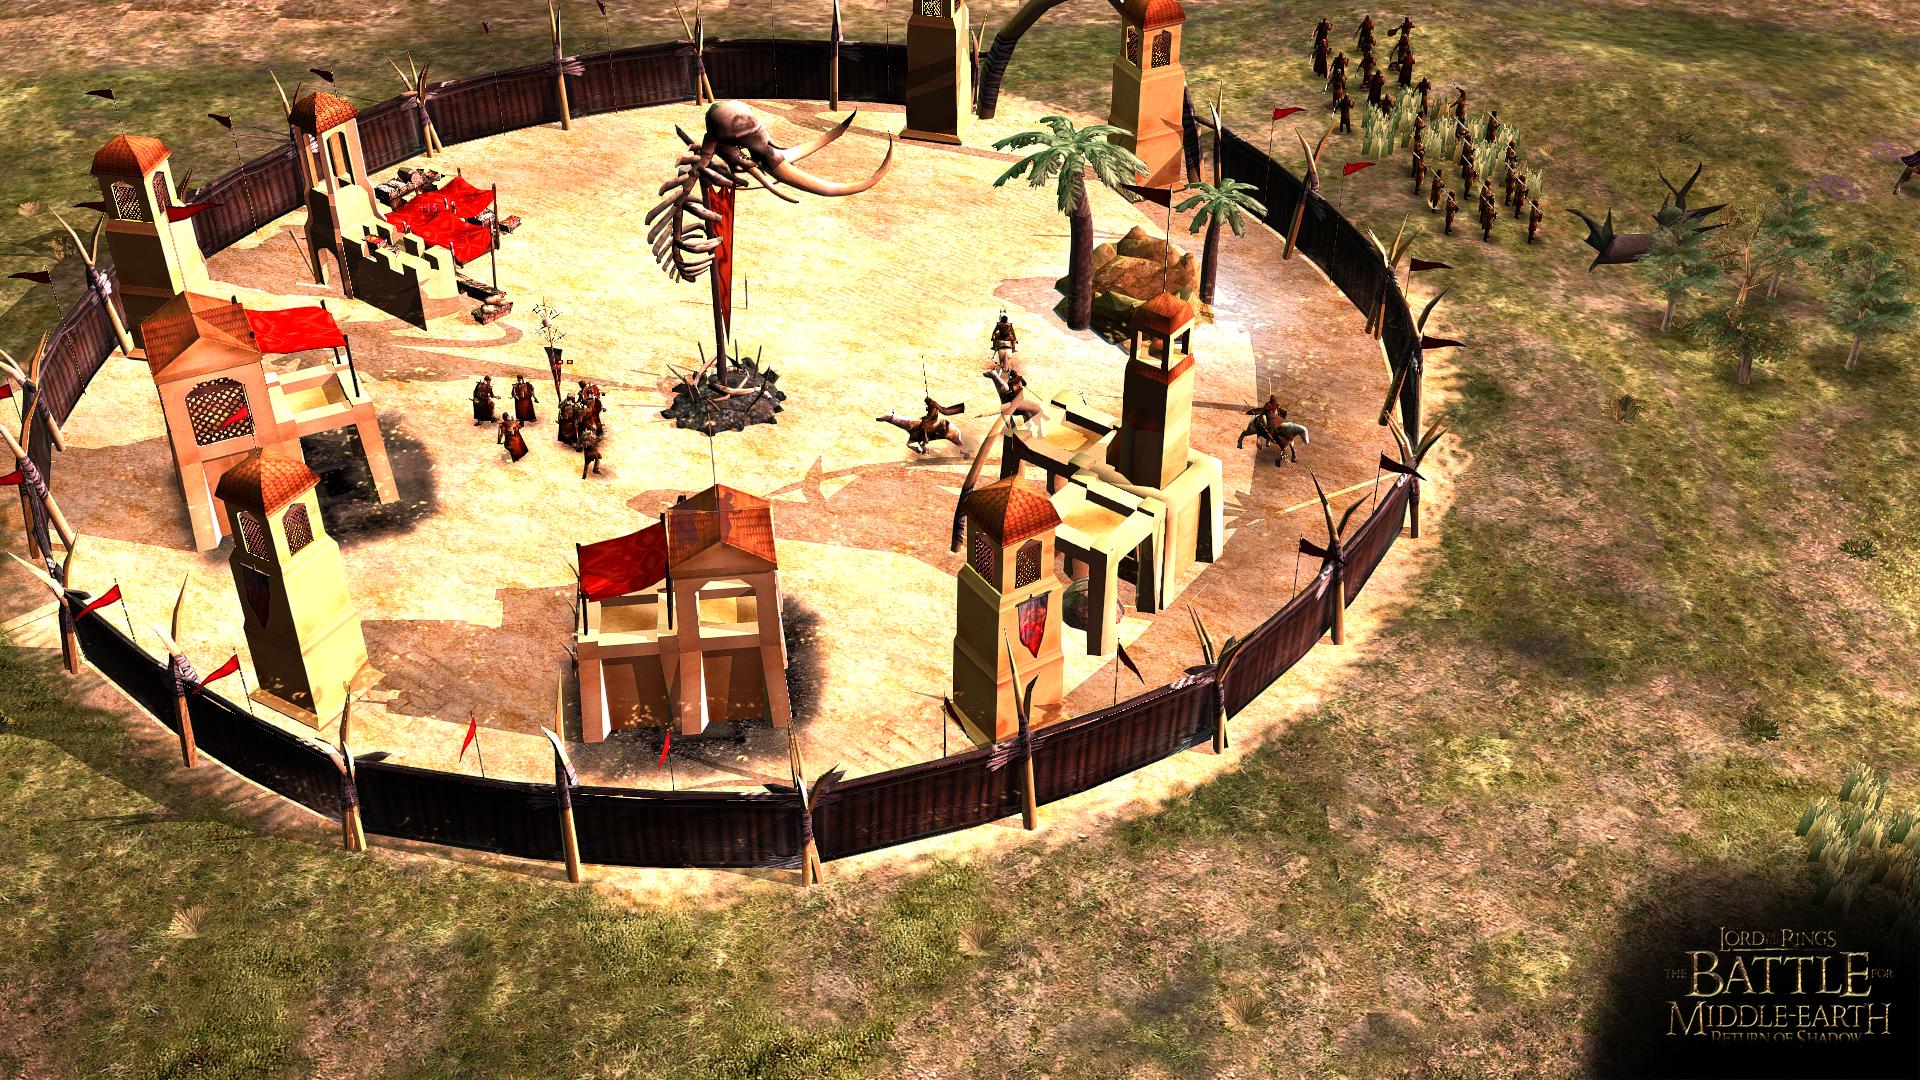 Harad Camp